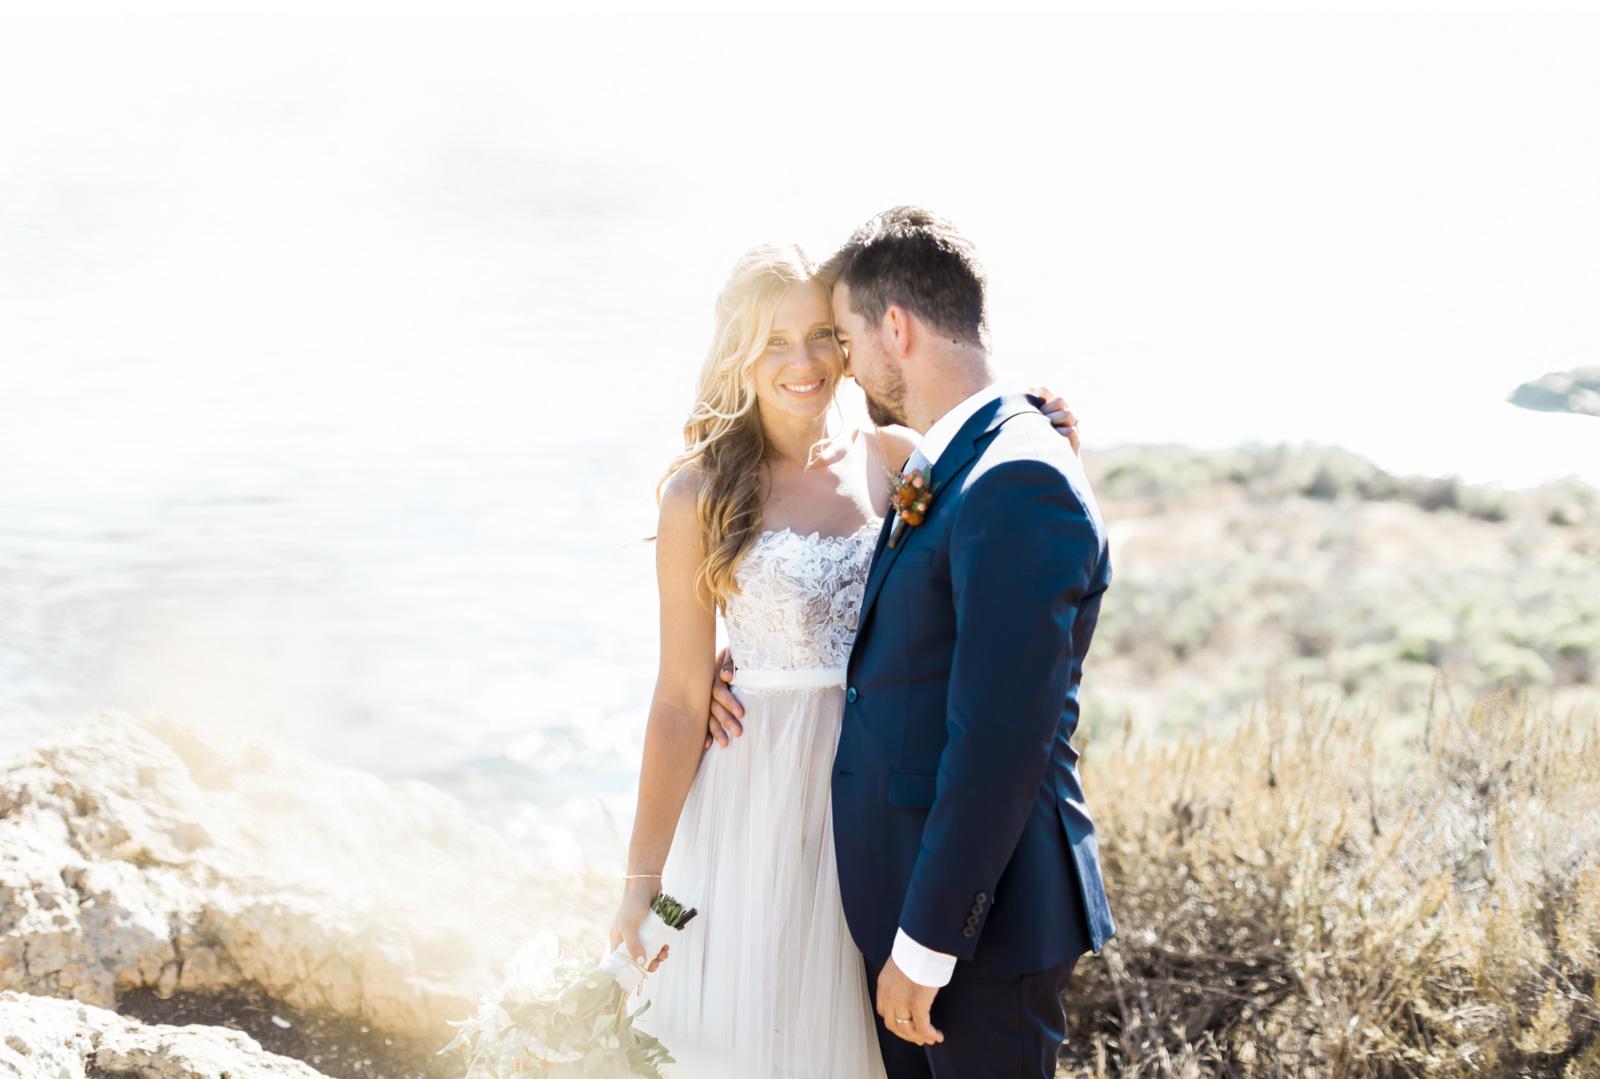 Avila-Beach-Wedding-Style-Me-Pretty-Natalie-Schutt-Photography_17.jpg